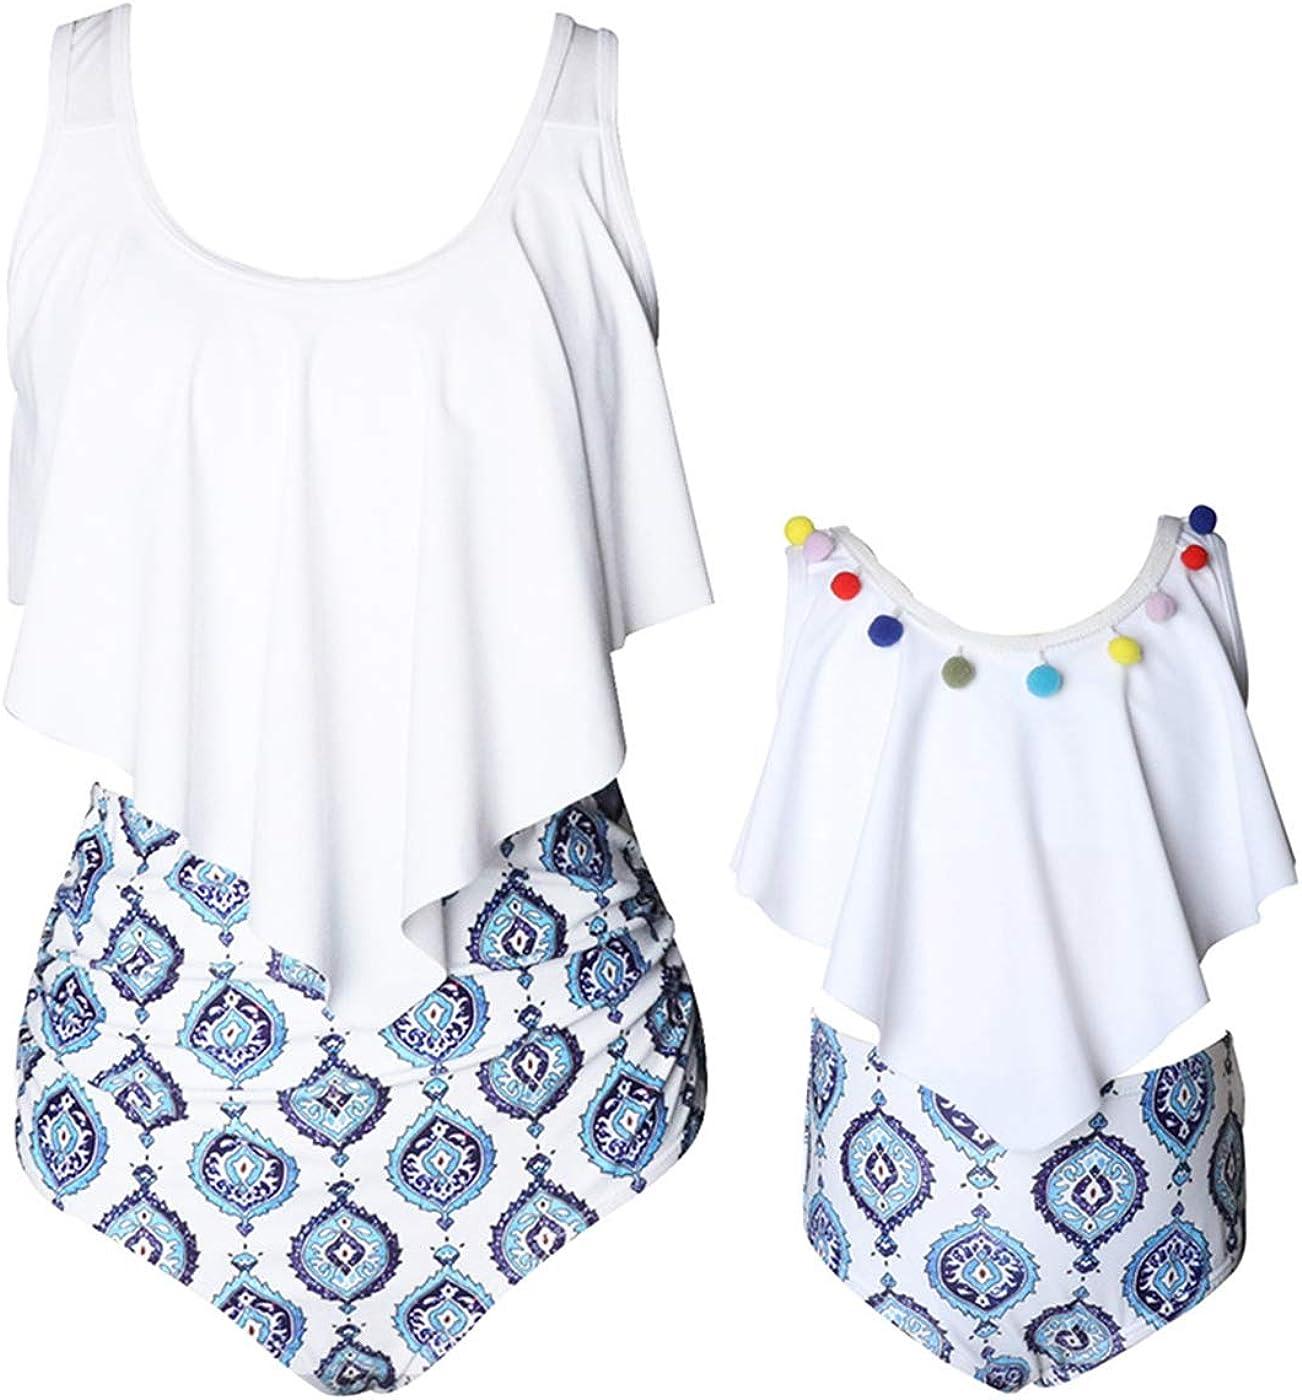 Family Matching Swimwear, PalmLeaves Printed Ruffle Tassel Bikini Tankini Set Mommy and Daughter Swimsuit